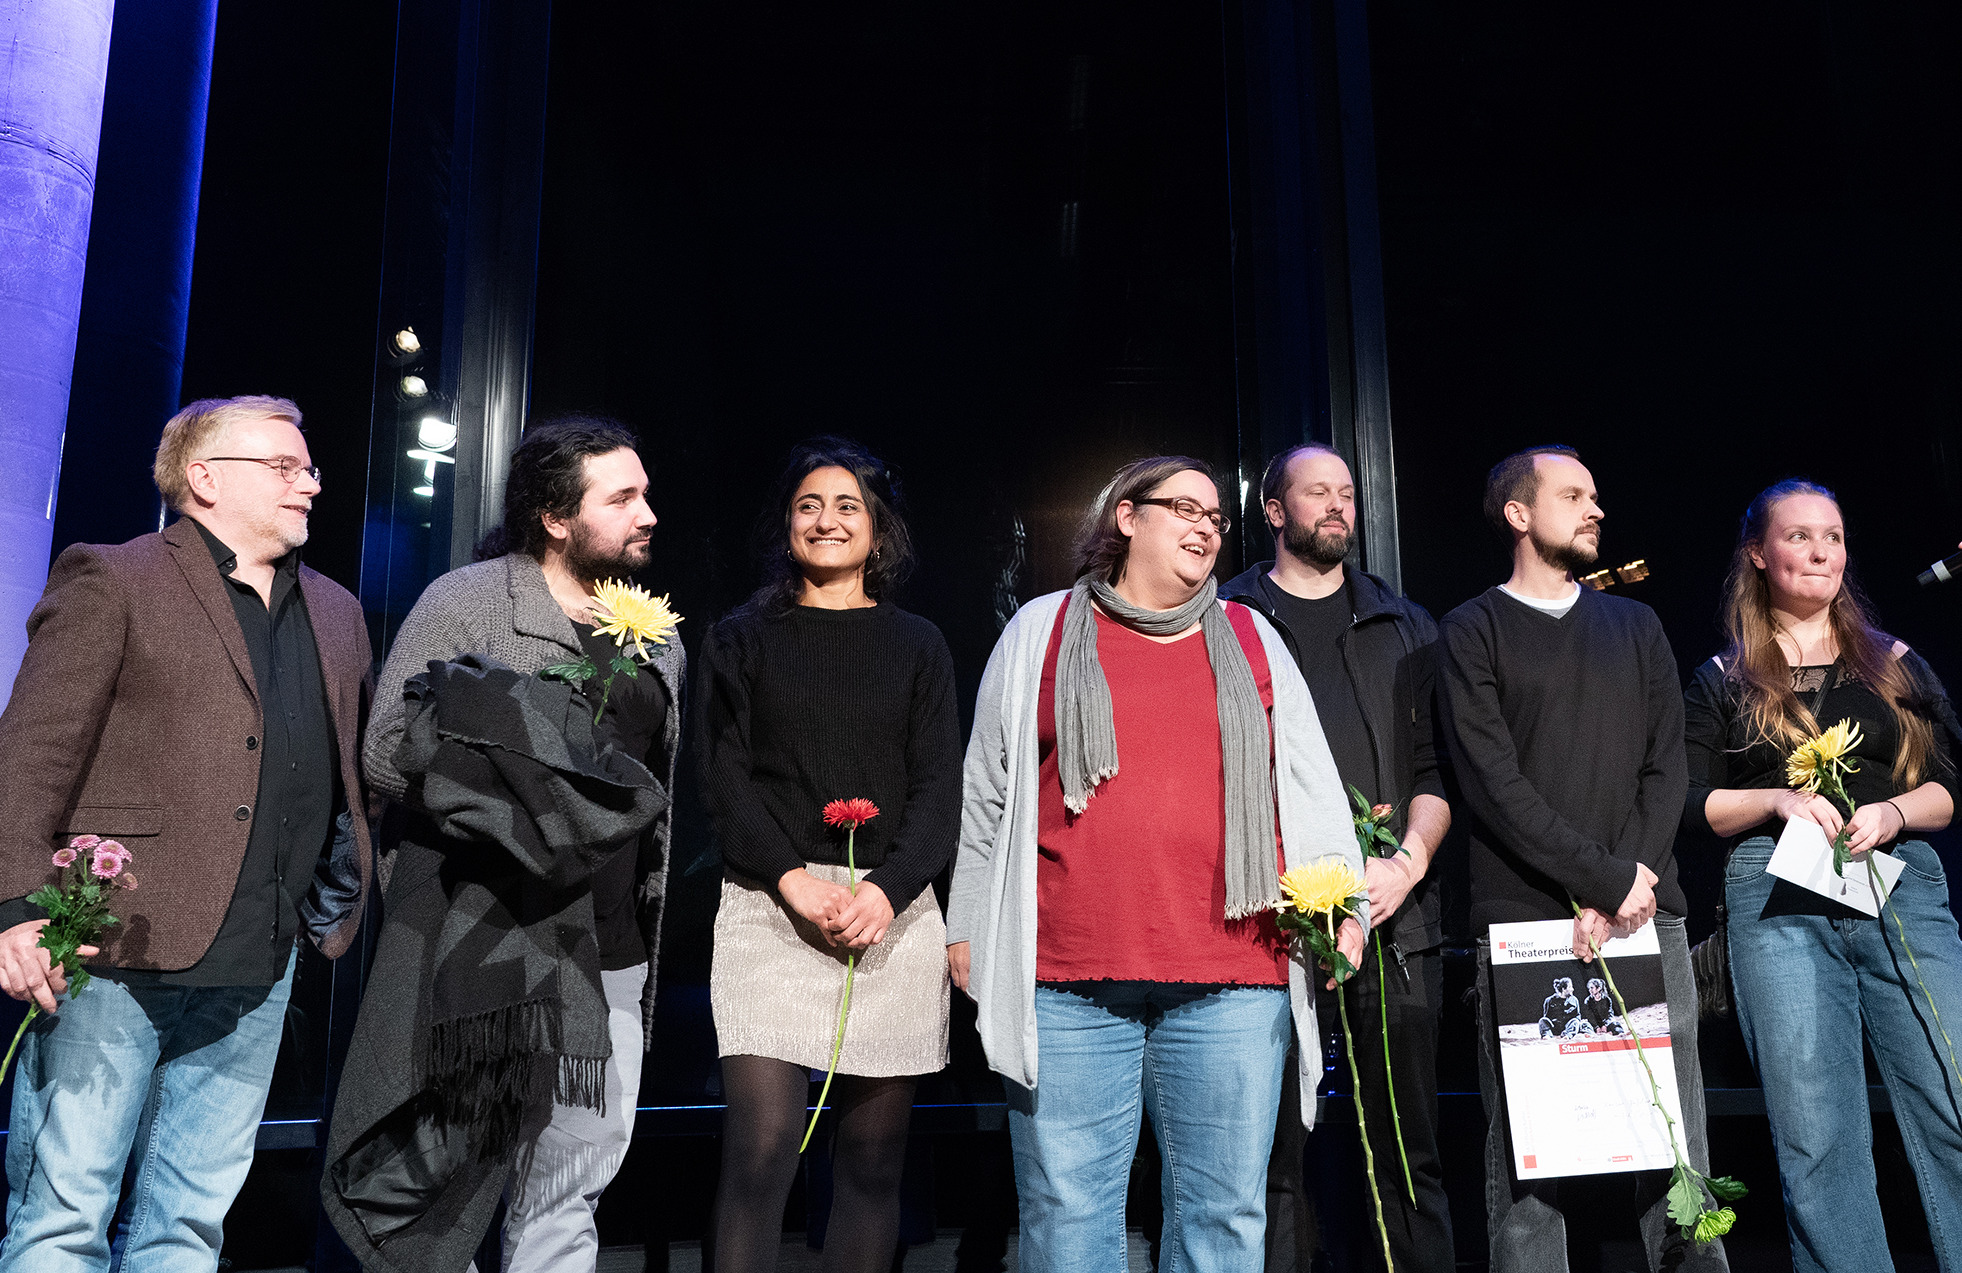 Theaterpreis 2019 an TAK-Dozent Tim Mrosek